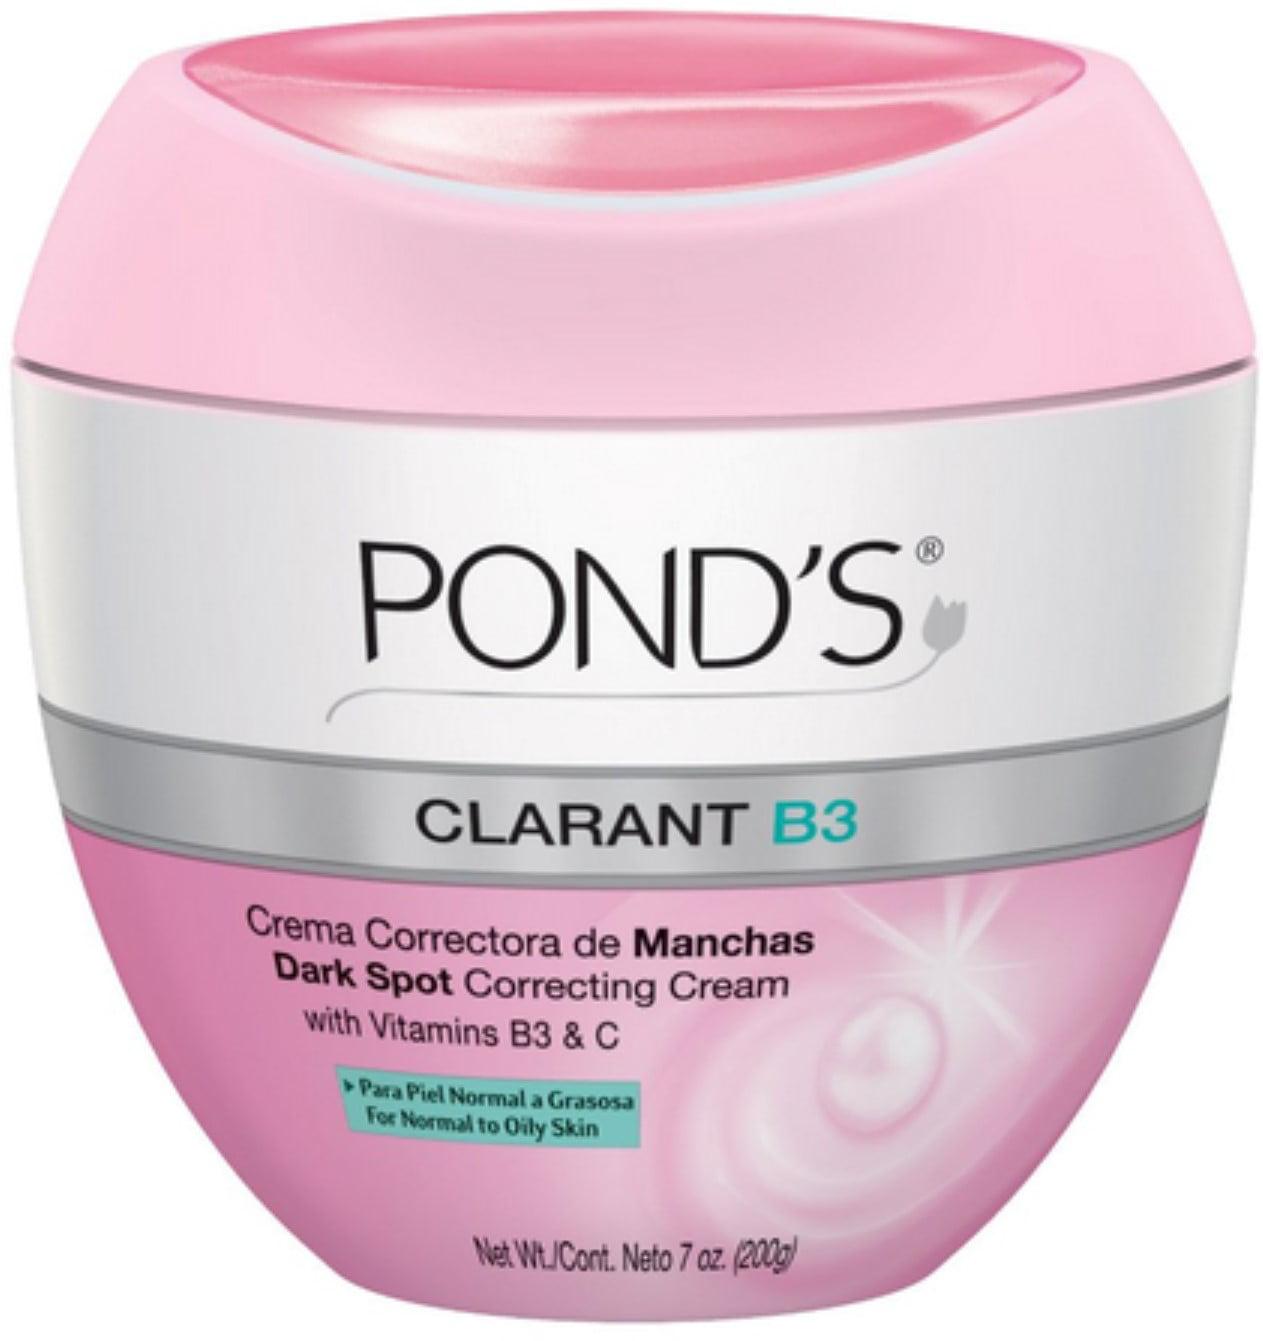 Pond's Clarant B3 Anti-Dark Spot Moisturizer Normal to Oily Skin 7oz (Pack of 3)